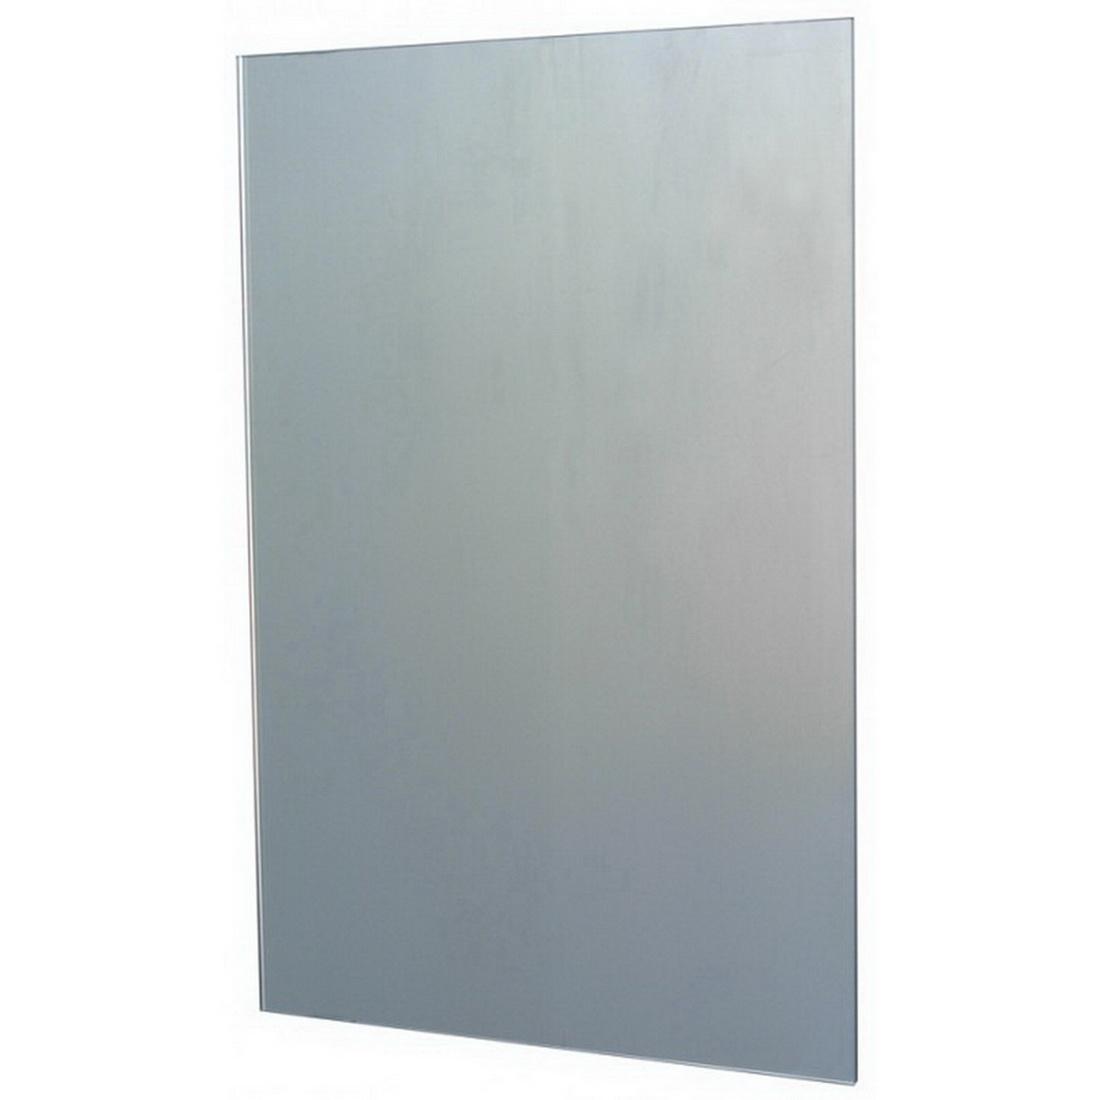 Trendy Mirror Styline Beveled Edge Mirror 900 x 750 mm 9X75STYBEV